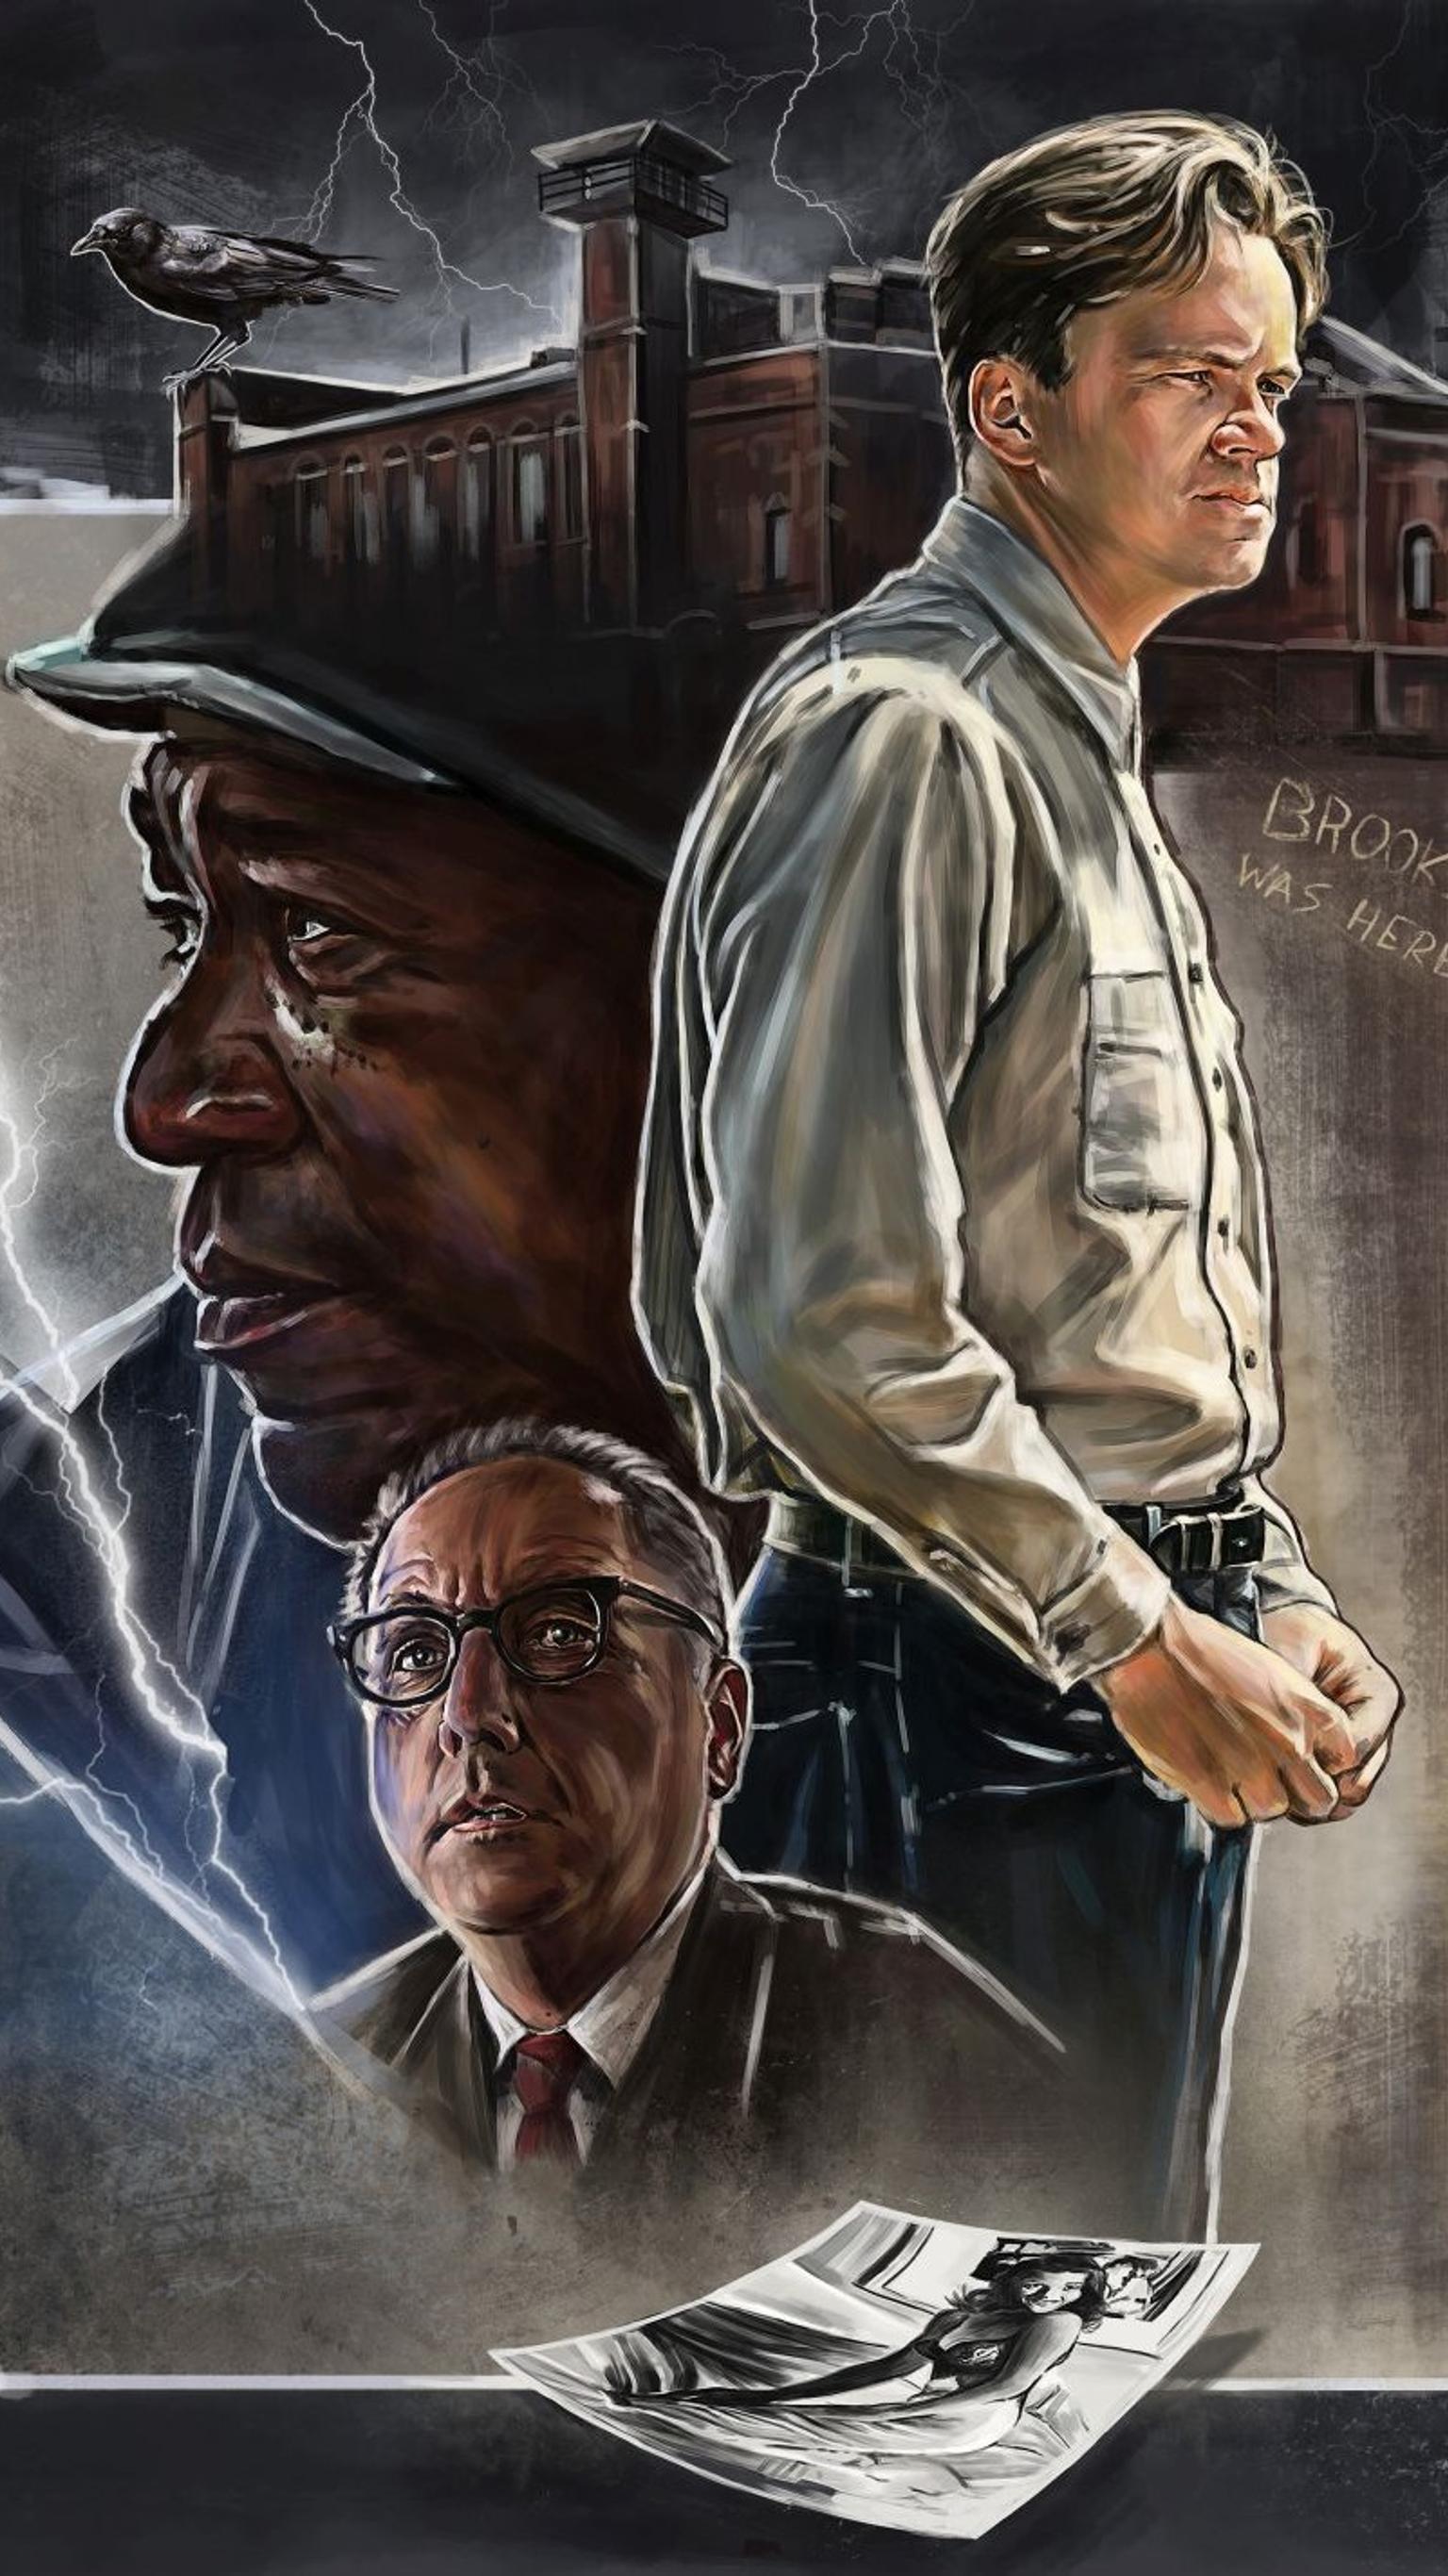 The Shawshank Redemption 1994 Phone Wallpaper Moviemania 1536x2732